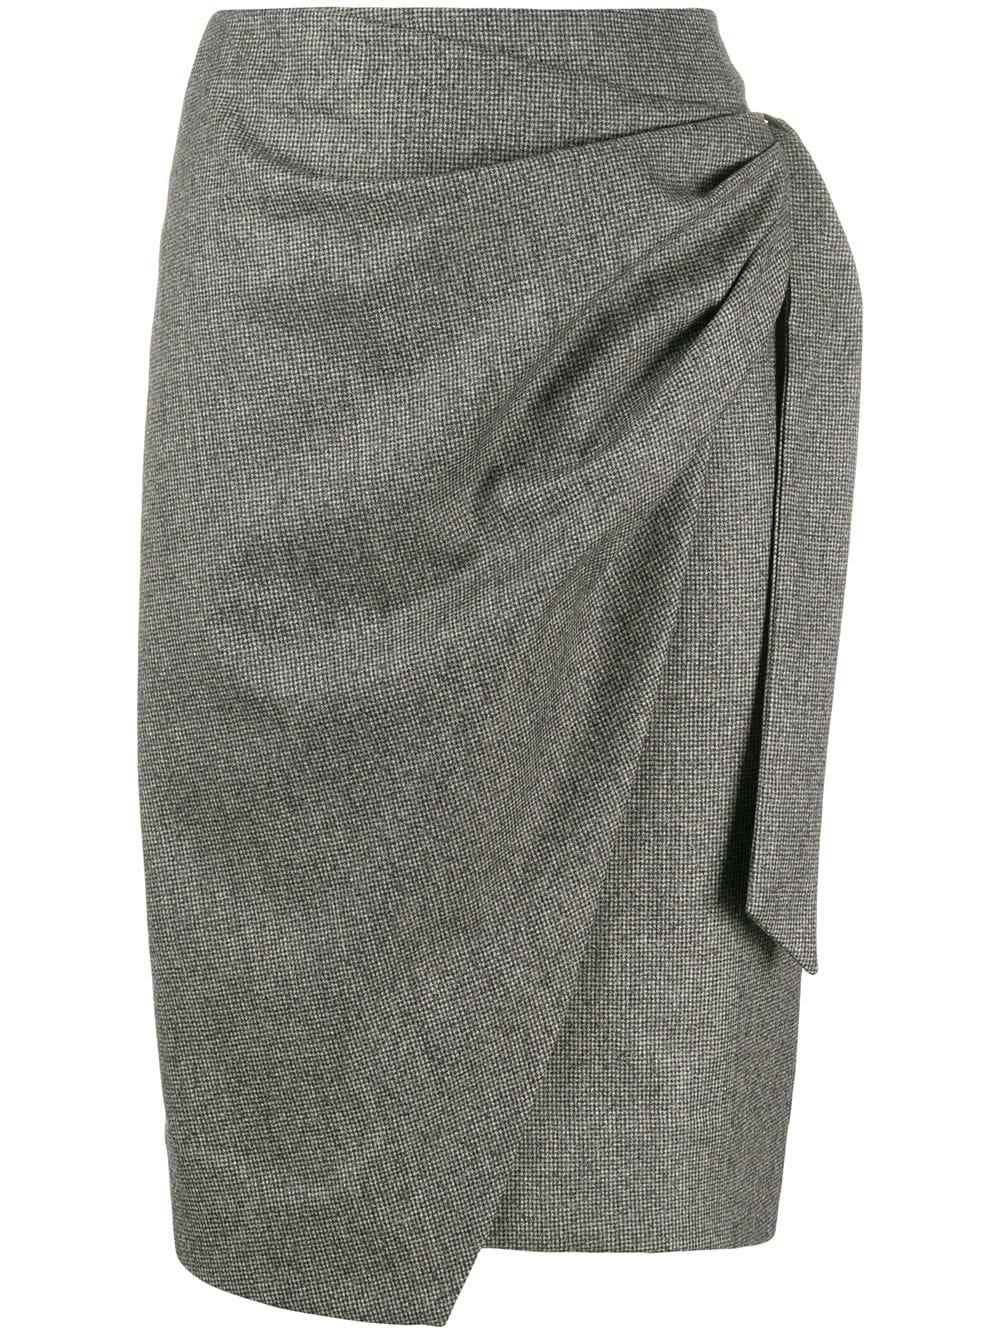 Isabel Marant юбка с драпировкой и запахом